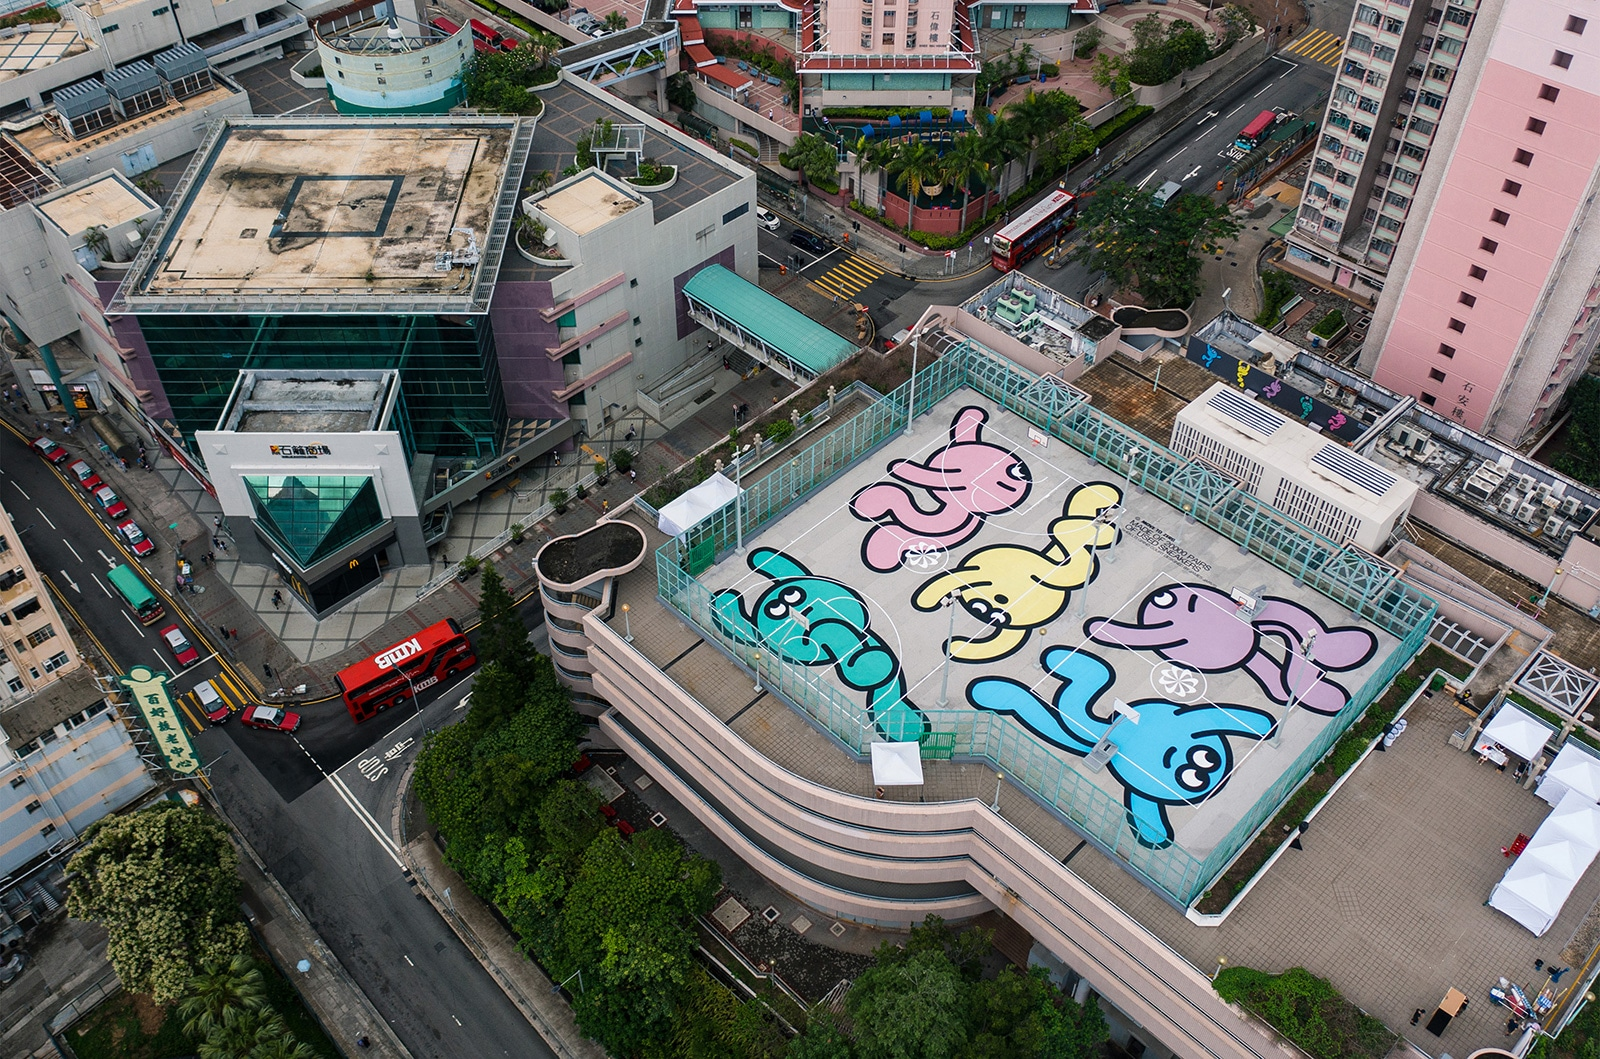 Корт Shek Lei Grind расположен на крыше здания